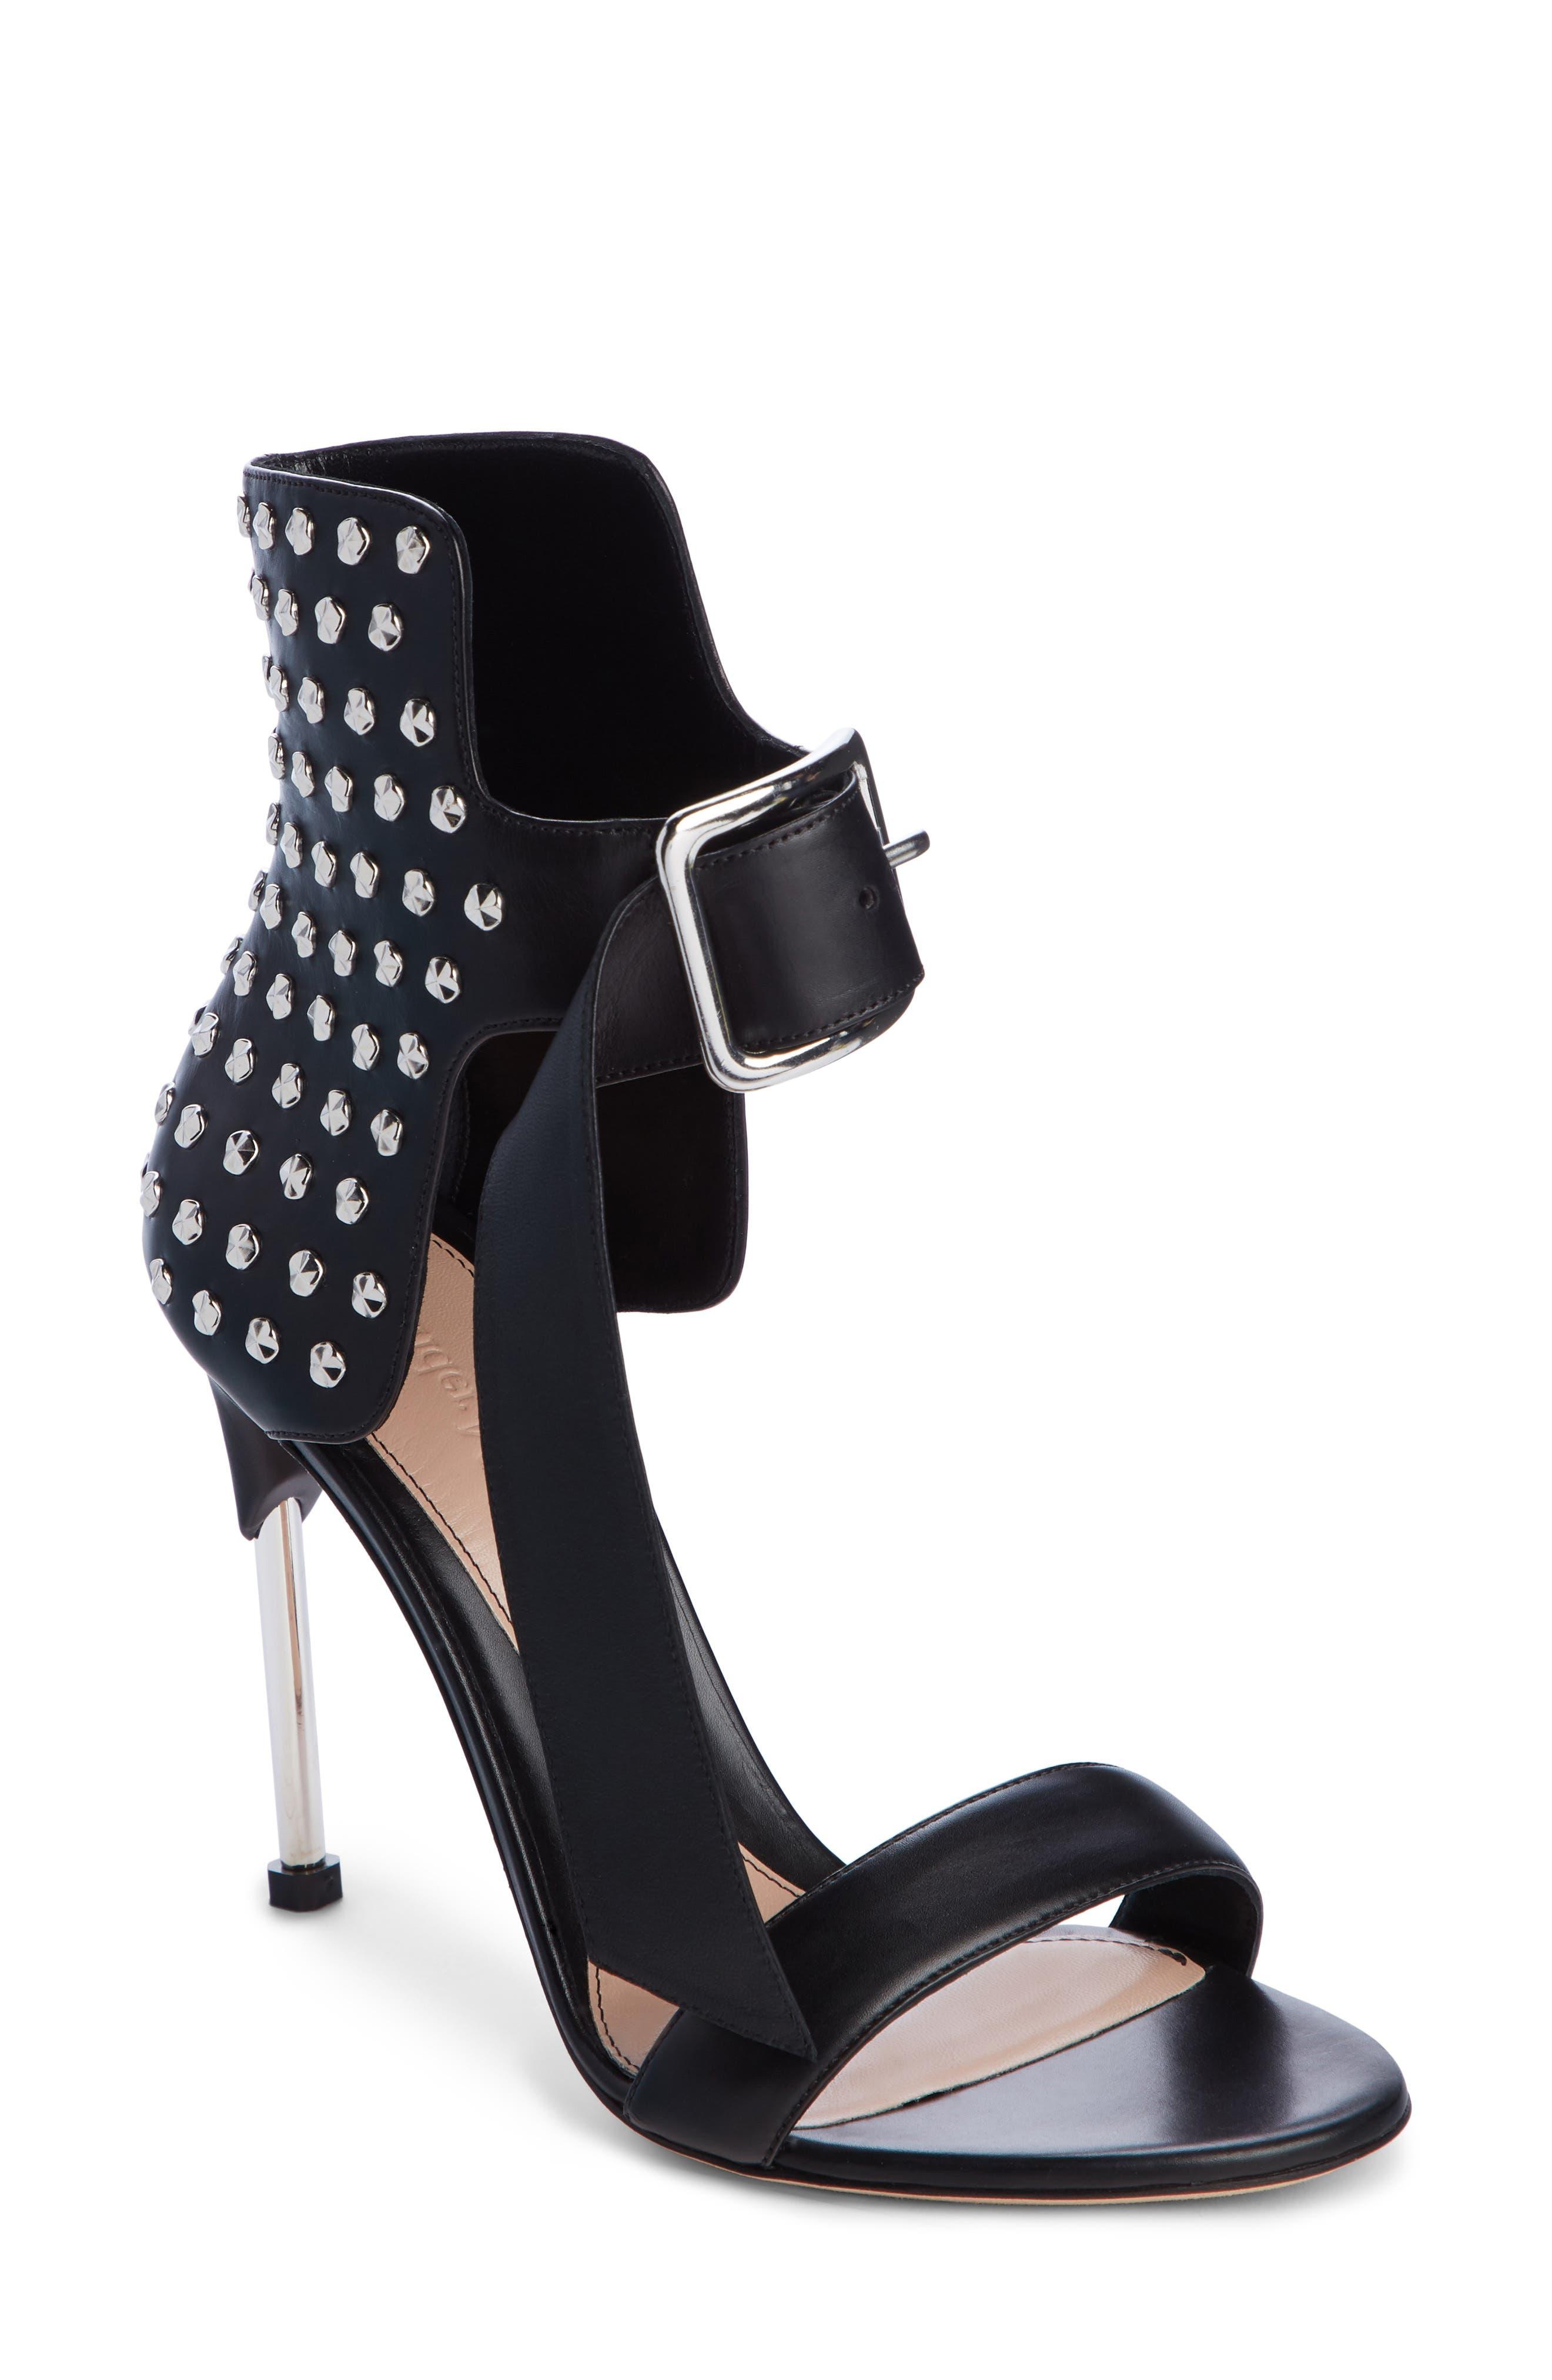 Alexander Mcqueen Studded Ankle Strap Sandal - Black